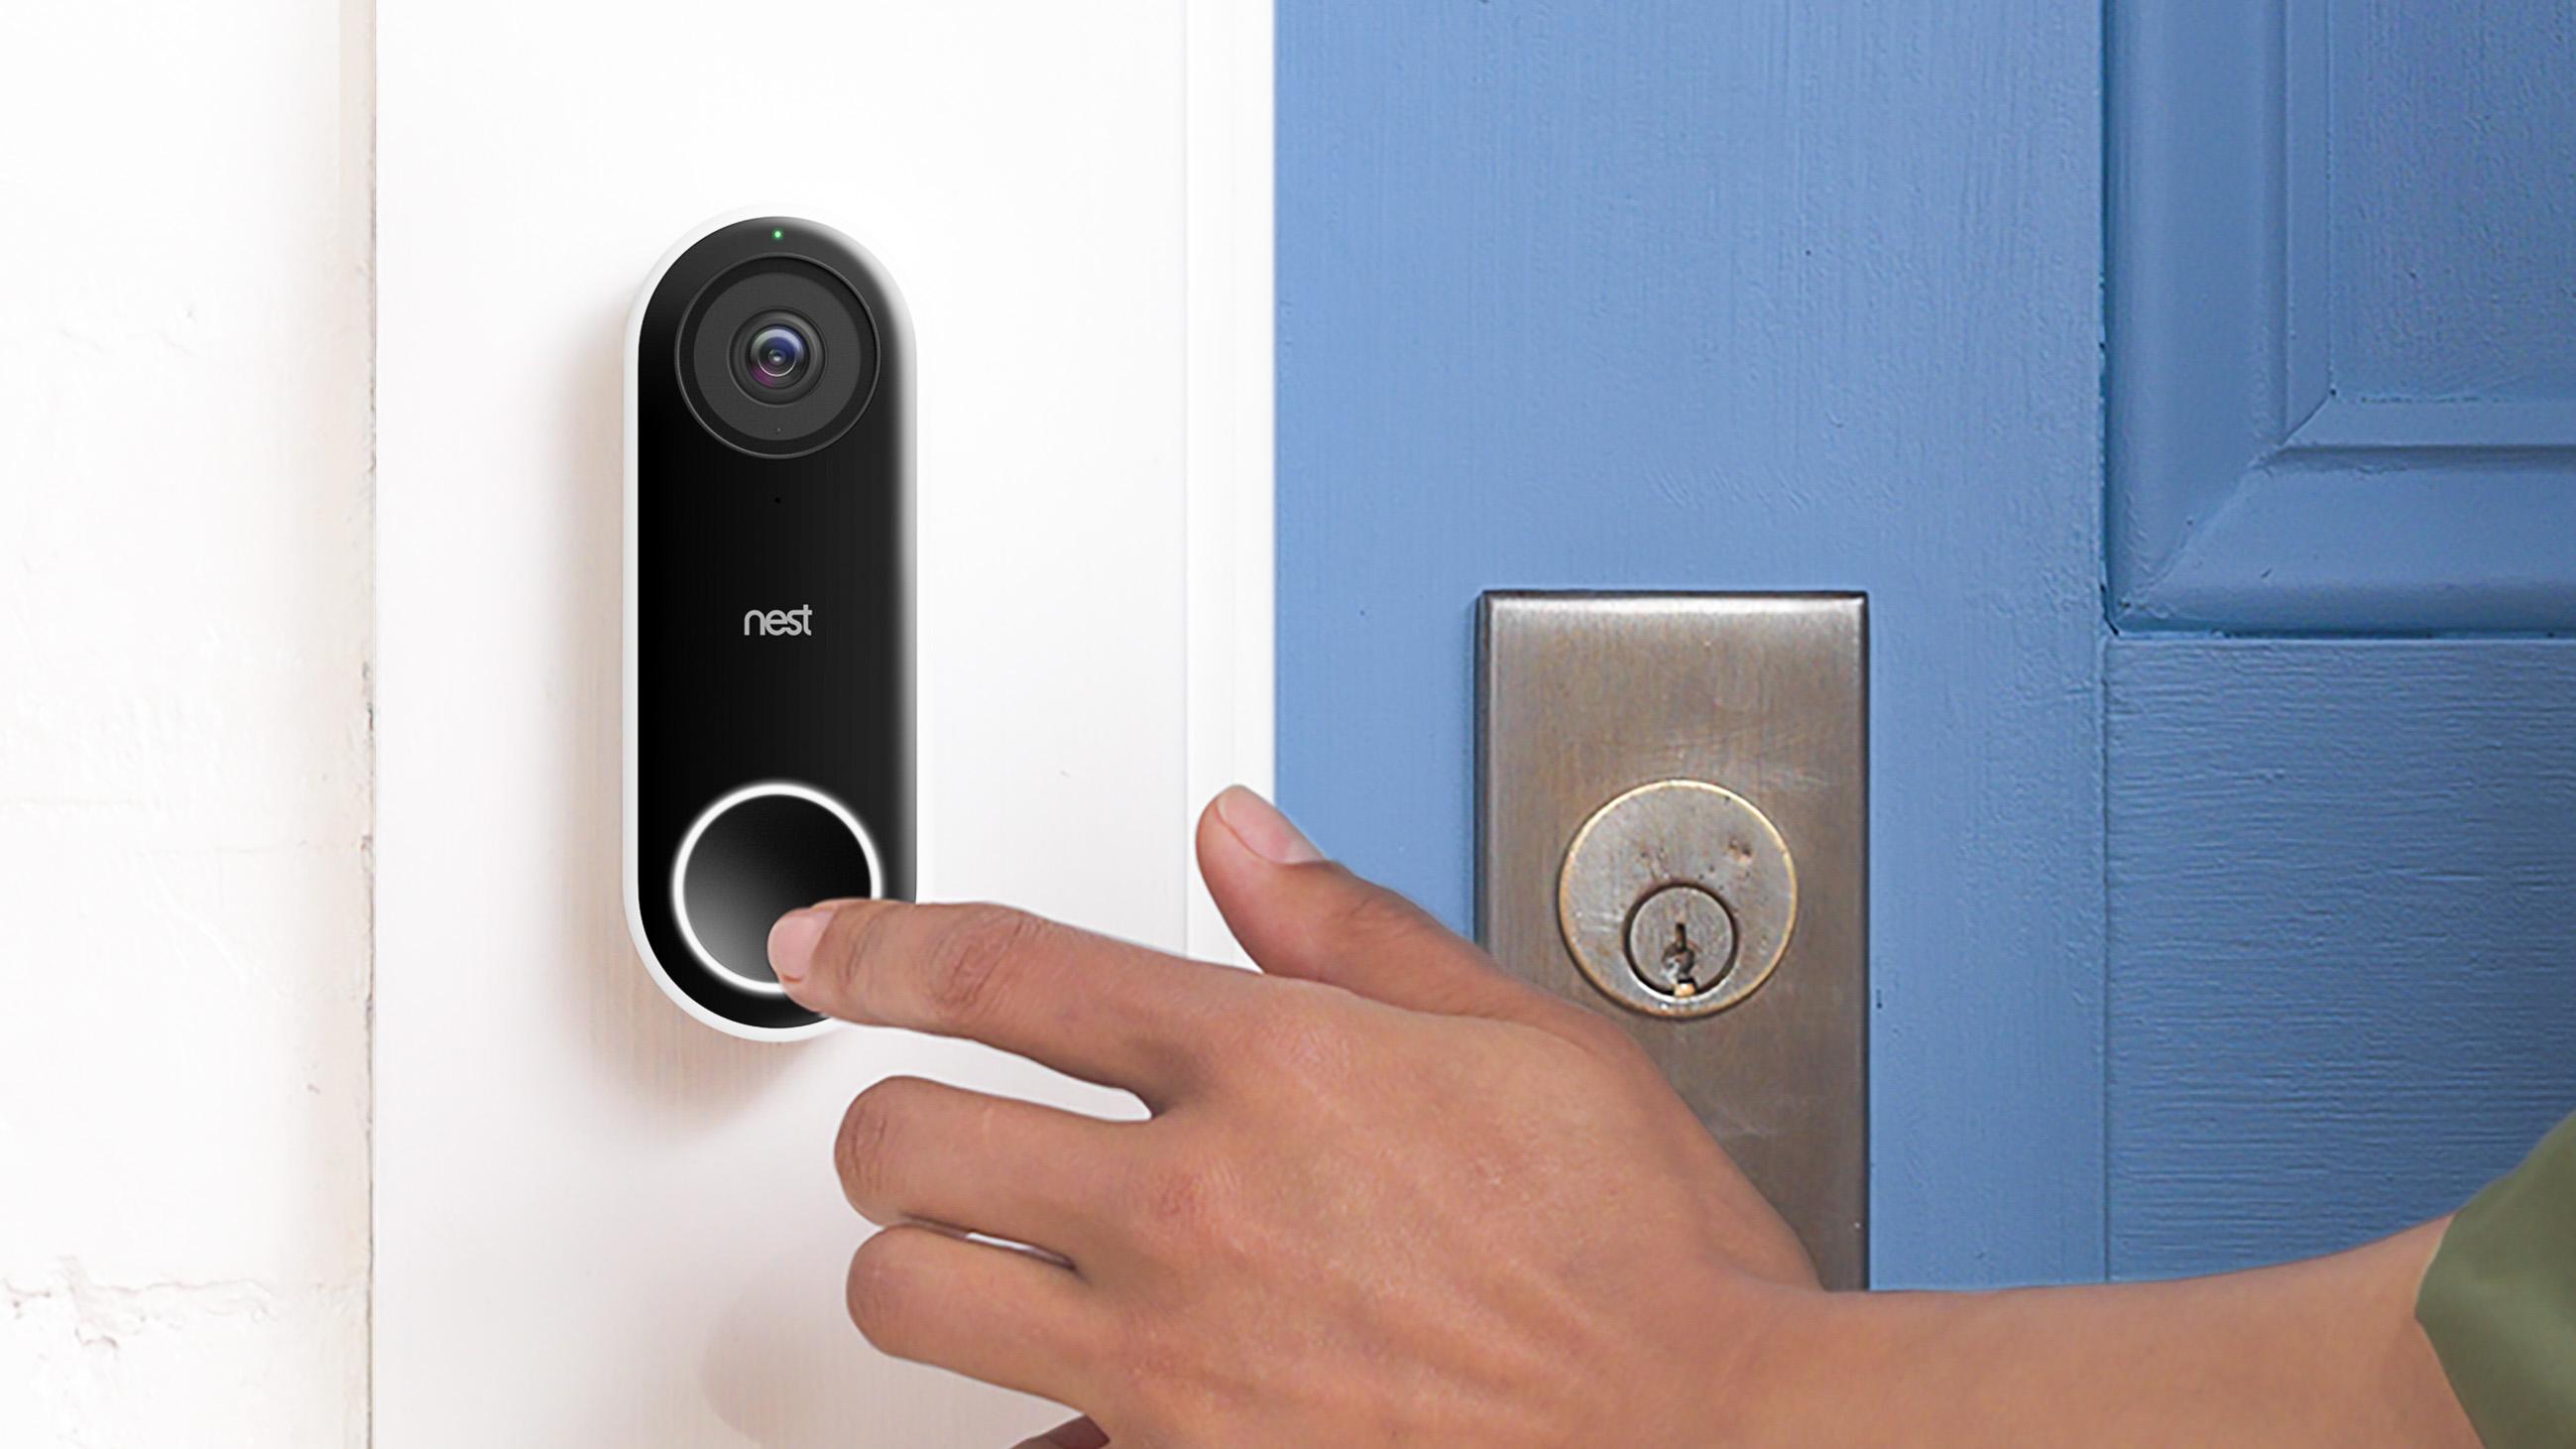 Best Doorbell Camera 2020.The Best Video Doorbell Camera In 2019 Who S That At Your